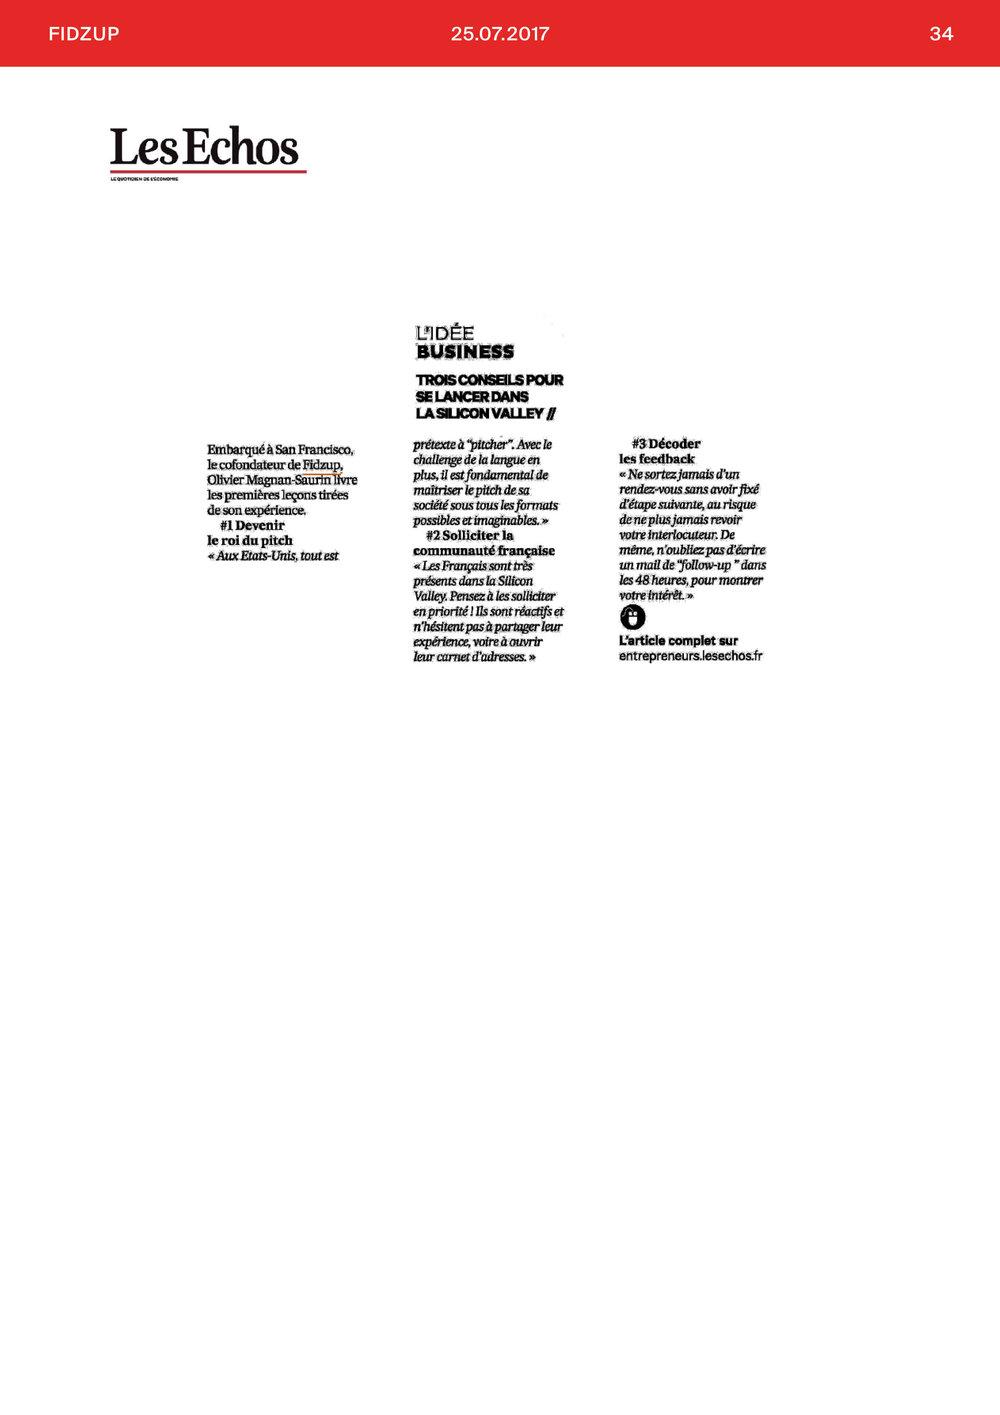 BOOKMEDIA_JUILLET_034.jpg